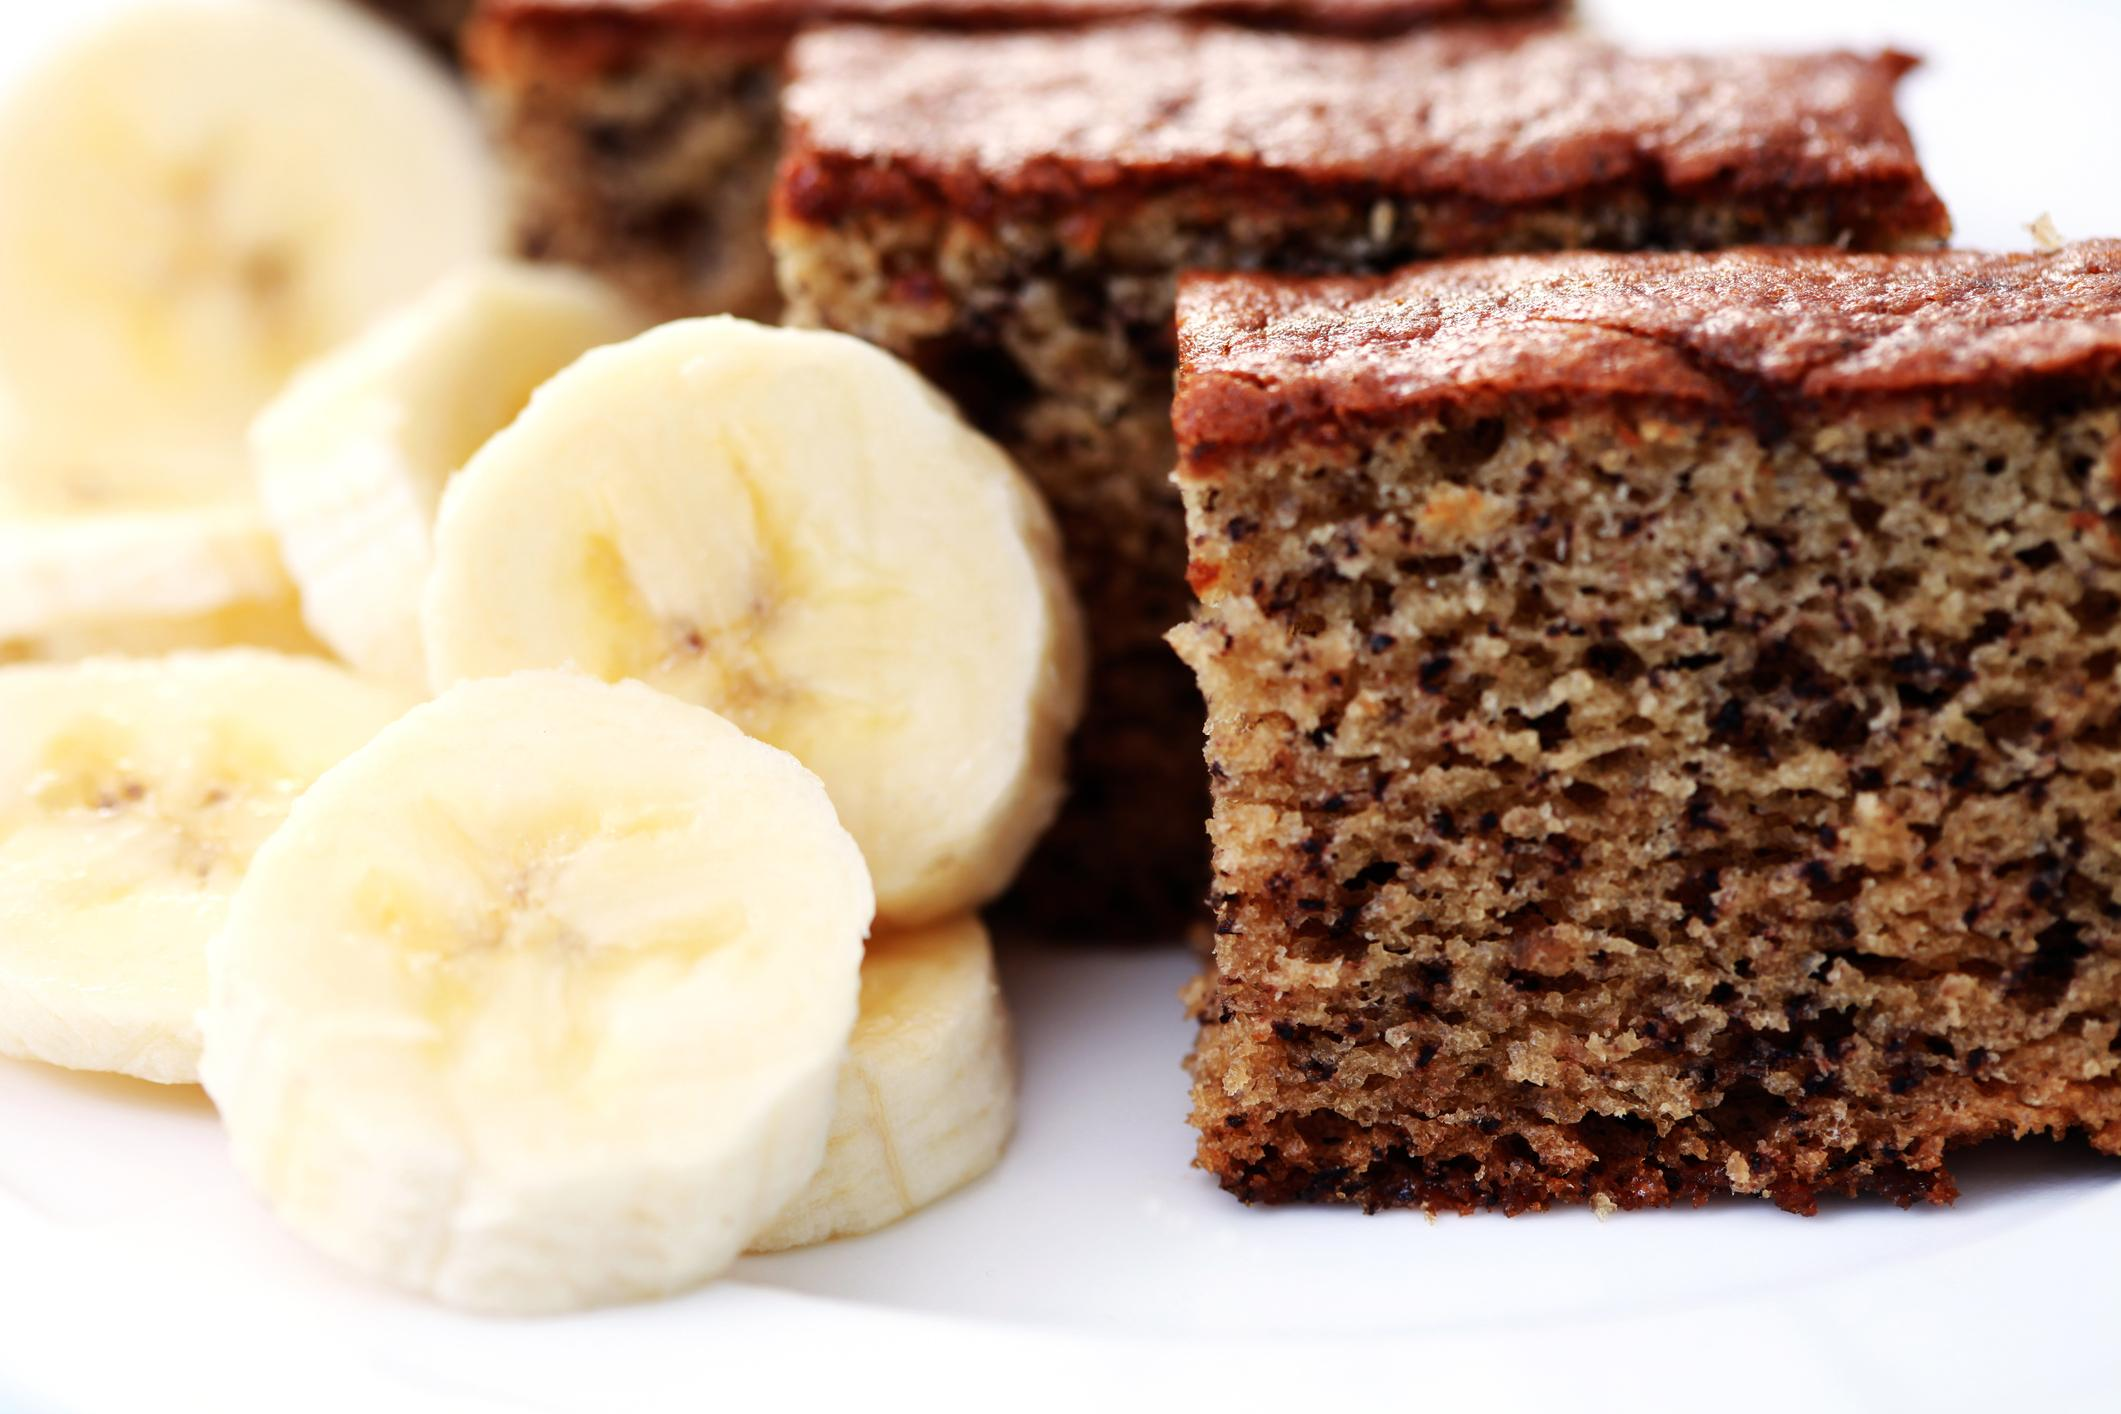 banana cake with a sliced banana